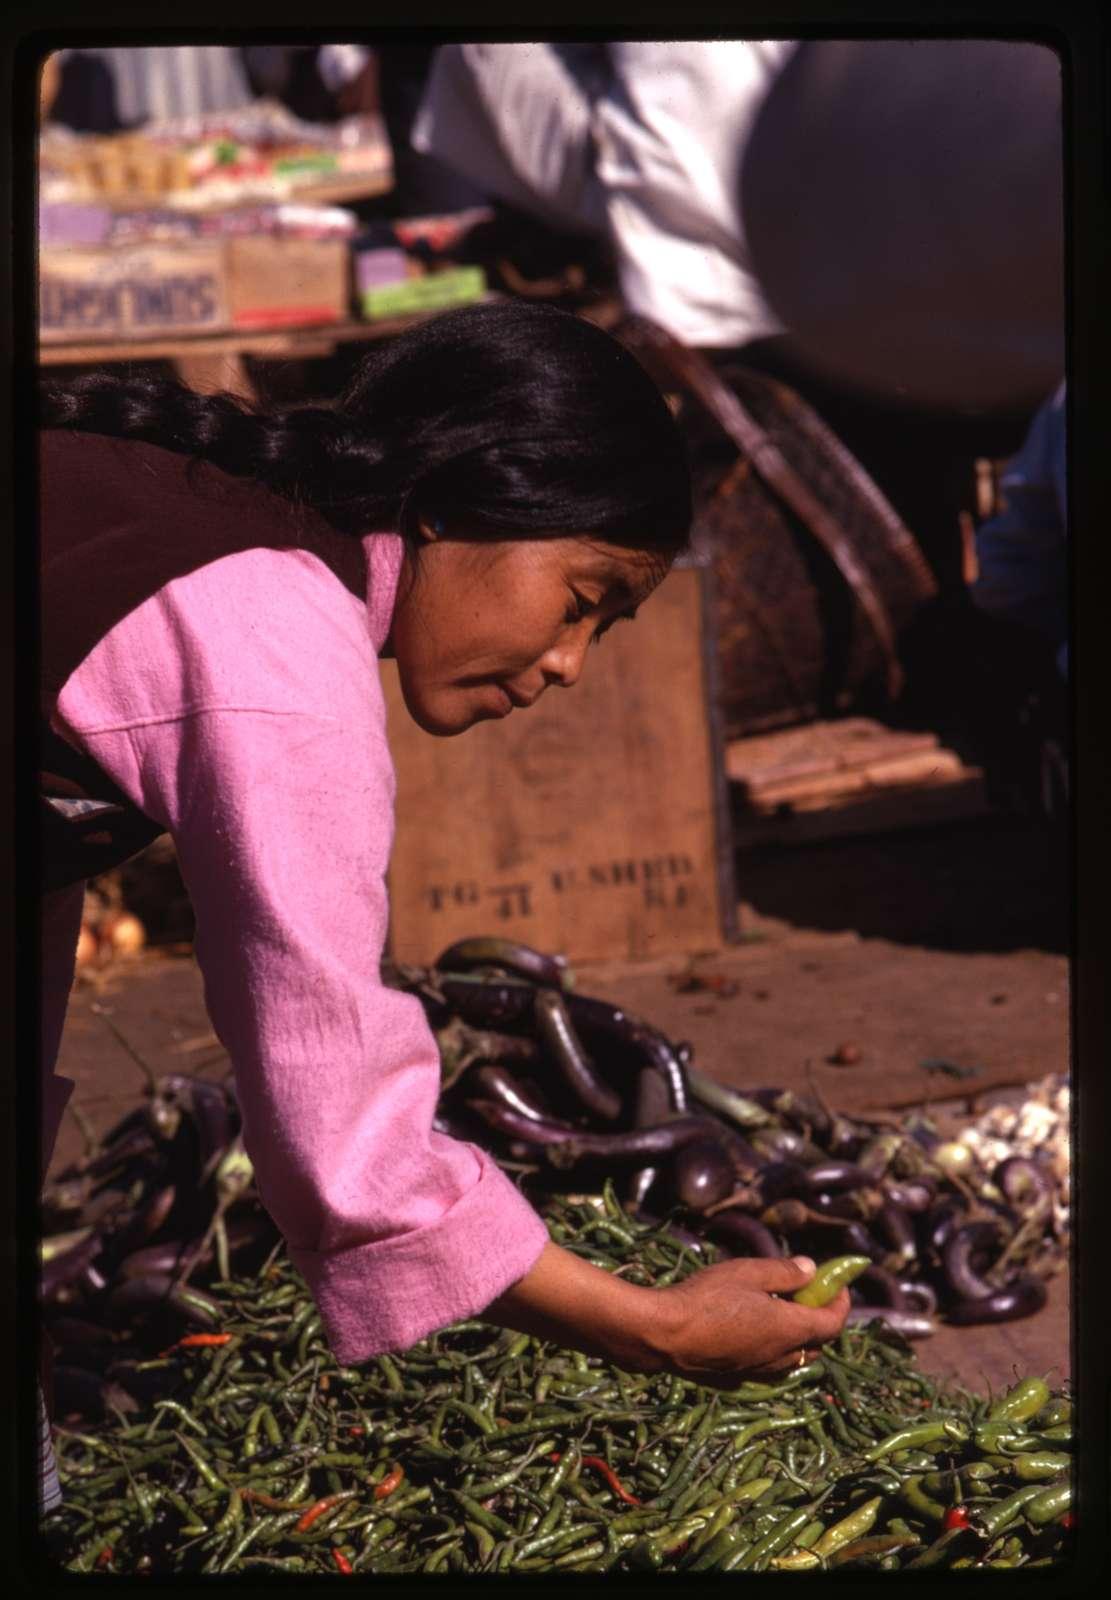 Chiles & eggplant on sale at Gangtok Bazaar, Sikkim